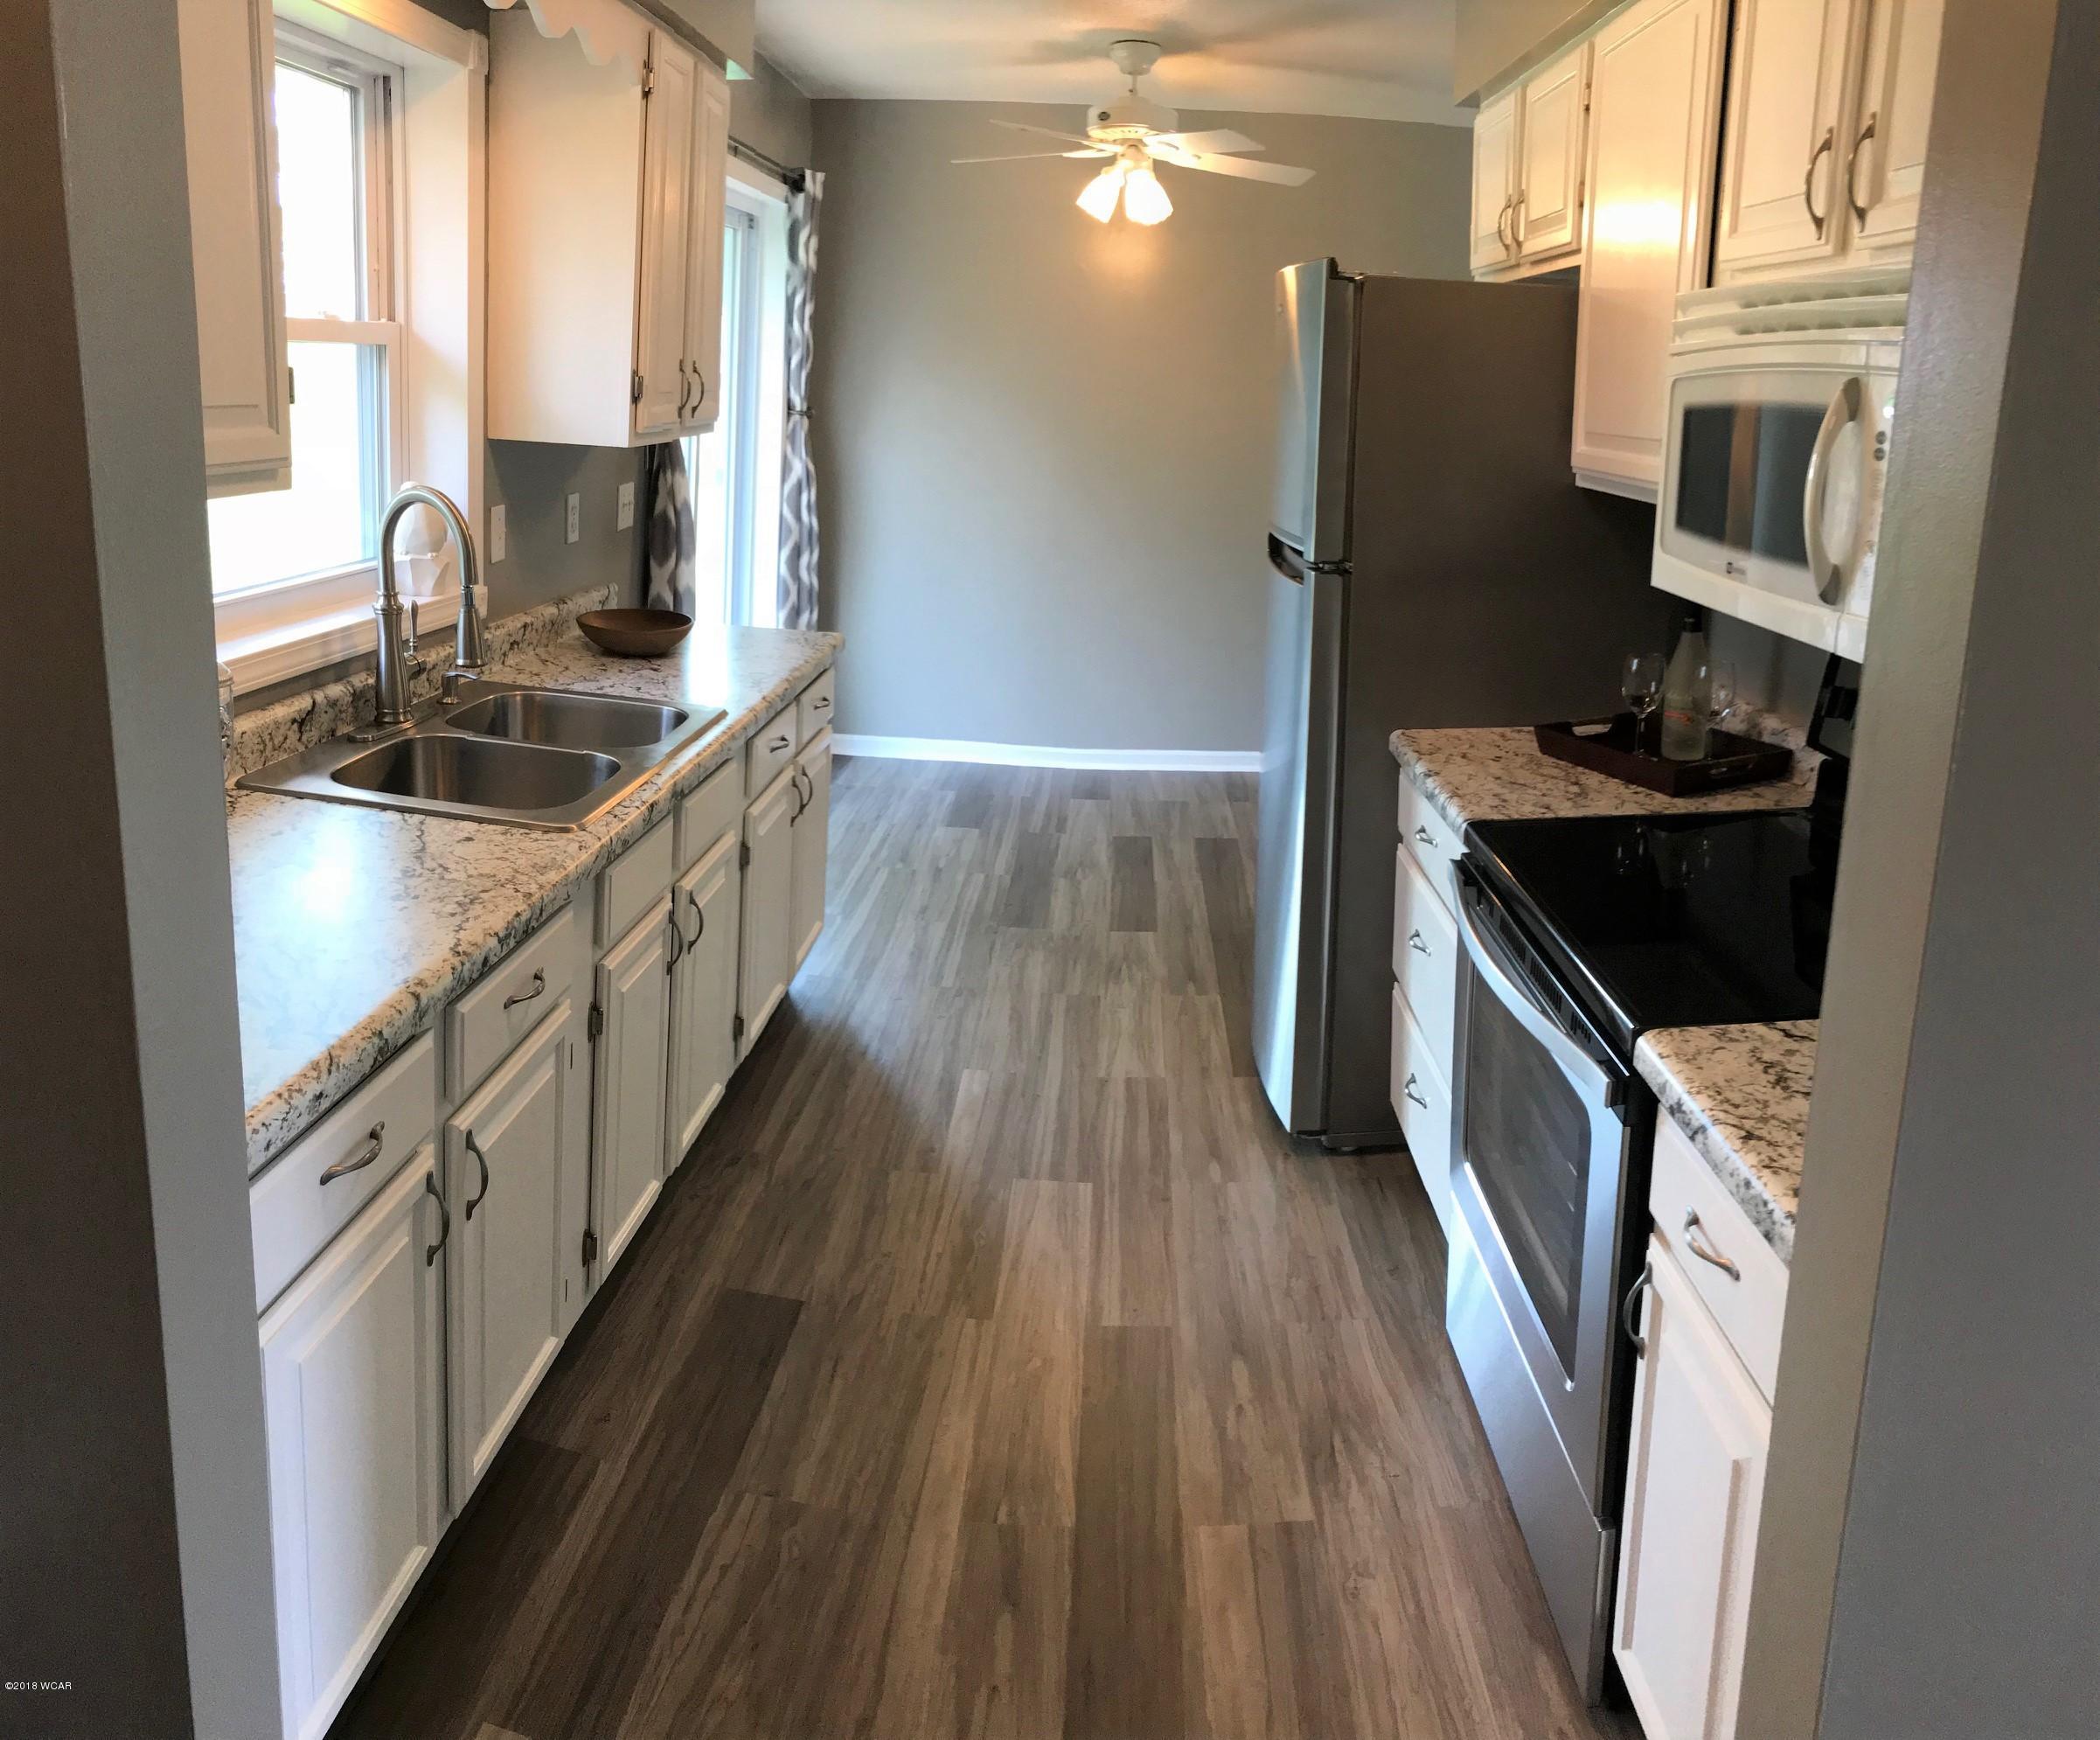 933 Mcdermott Avenue,Kandiyohi,3 Bedrooms Bedrooms,1 BathroomBathrooms,Single Family,Mcdermott Avenue,6030654